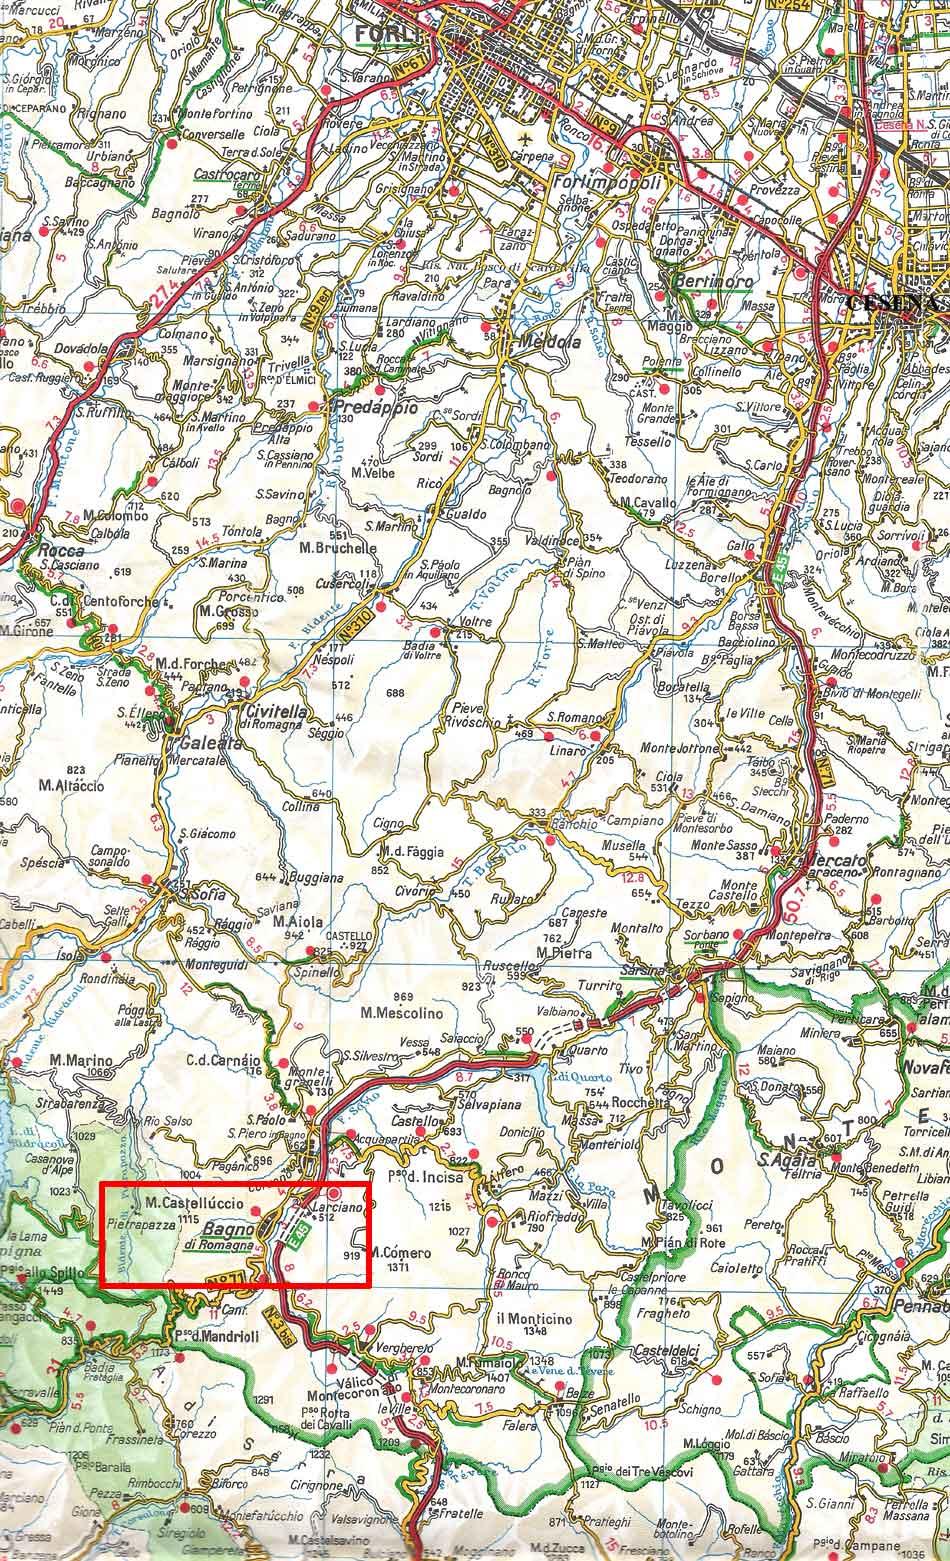 Varie - Mappe - BAGNO DI ROMAGNA (FC)